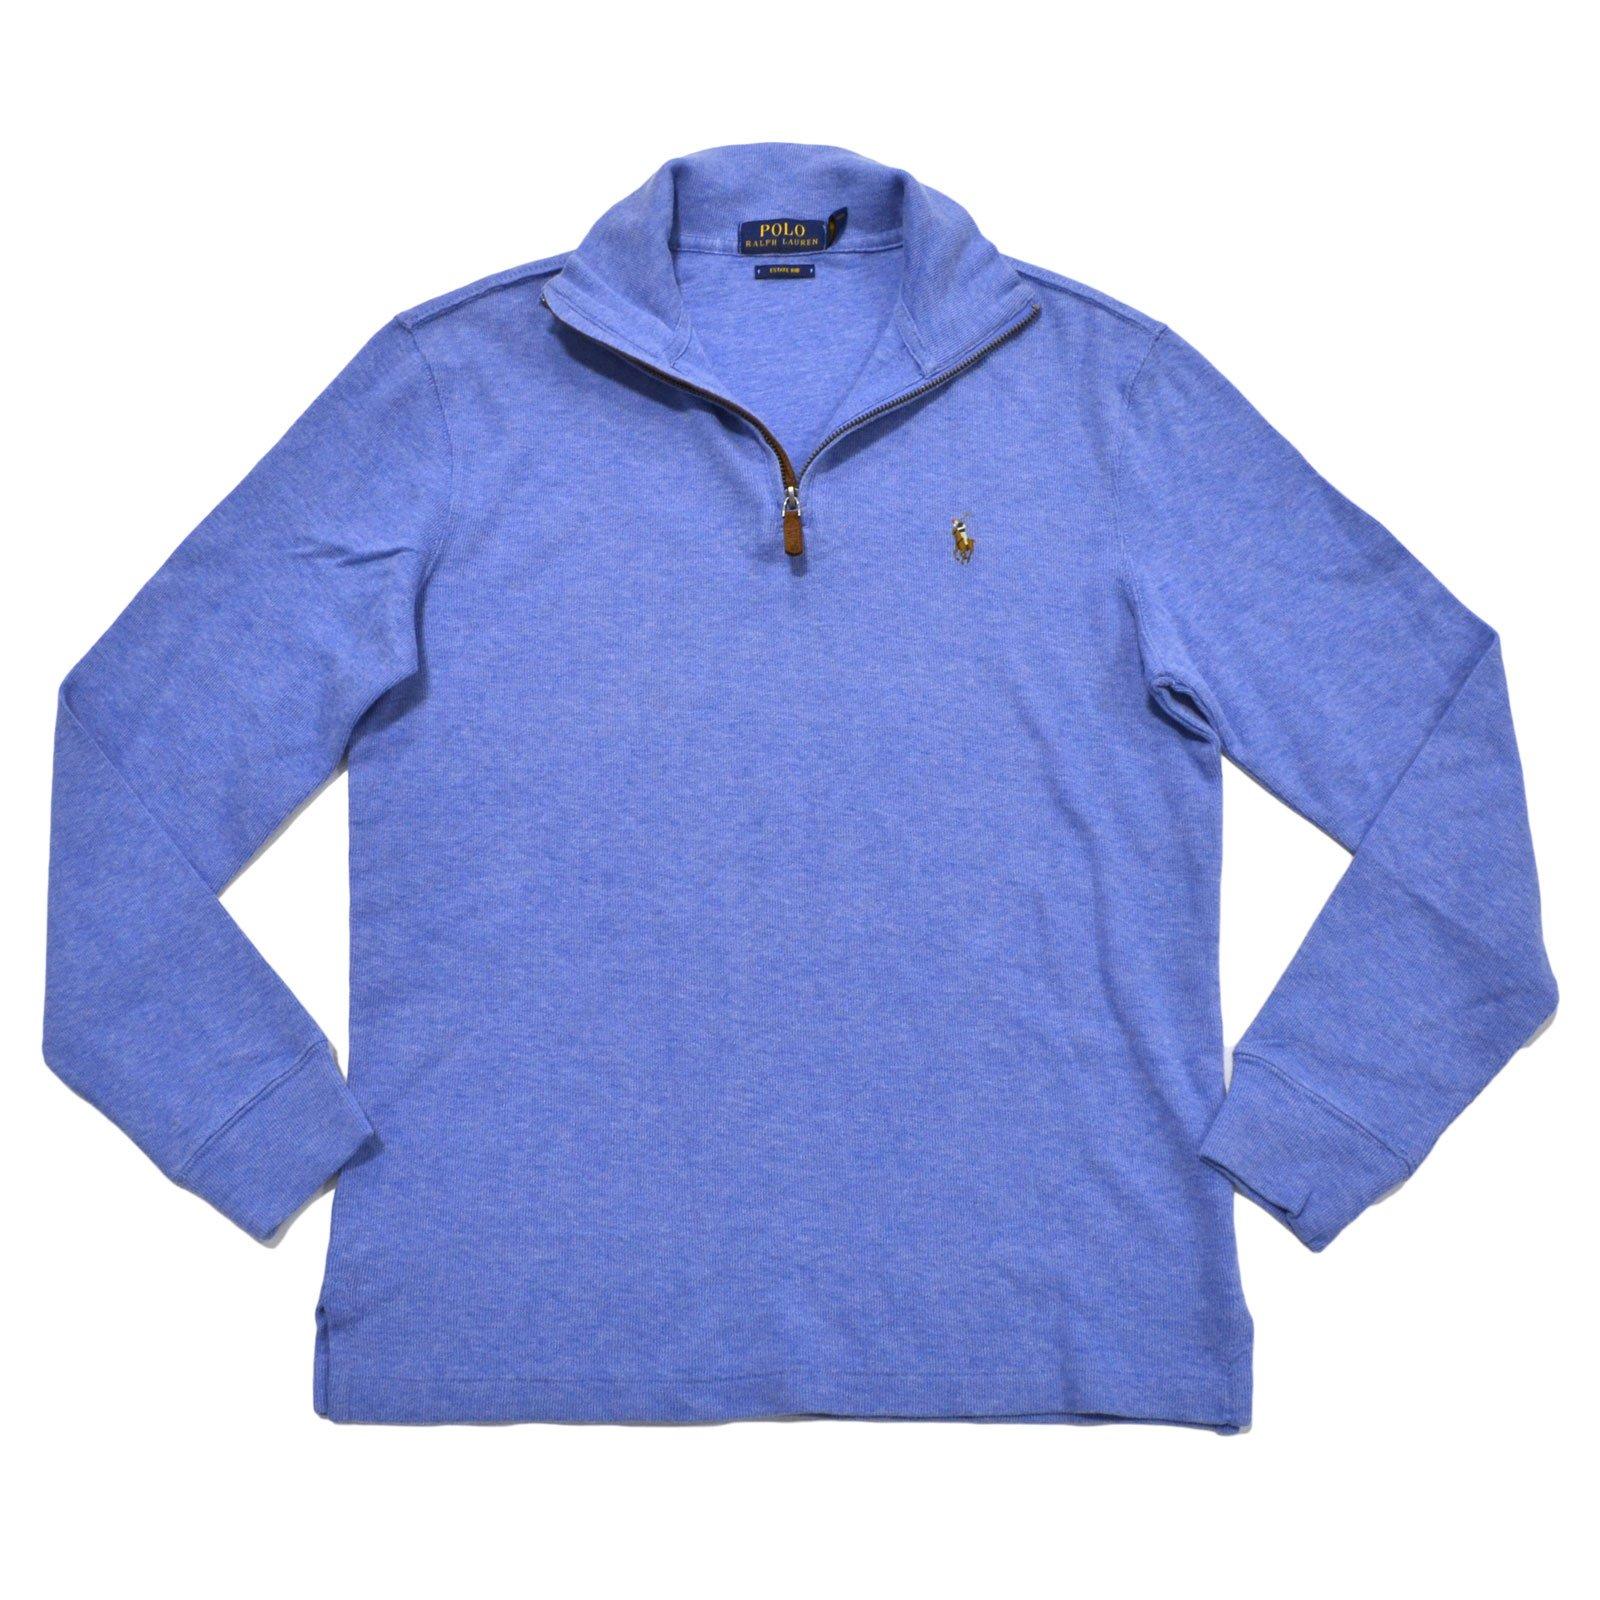 Polo Ralph Lauren Men's Estate Rib Half Zip Sweater, XL, Welsh Blue